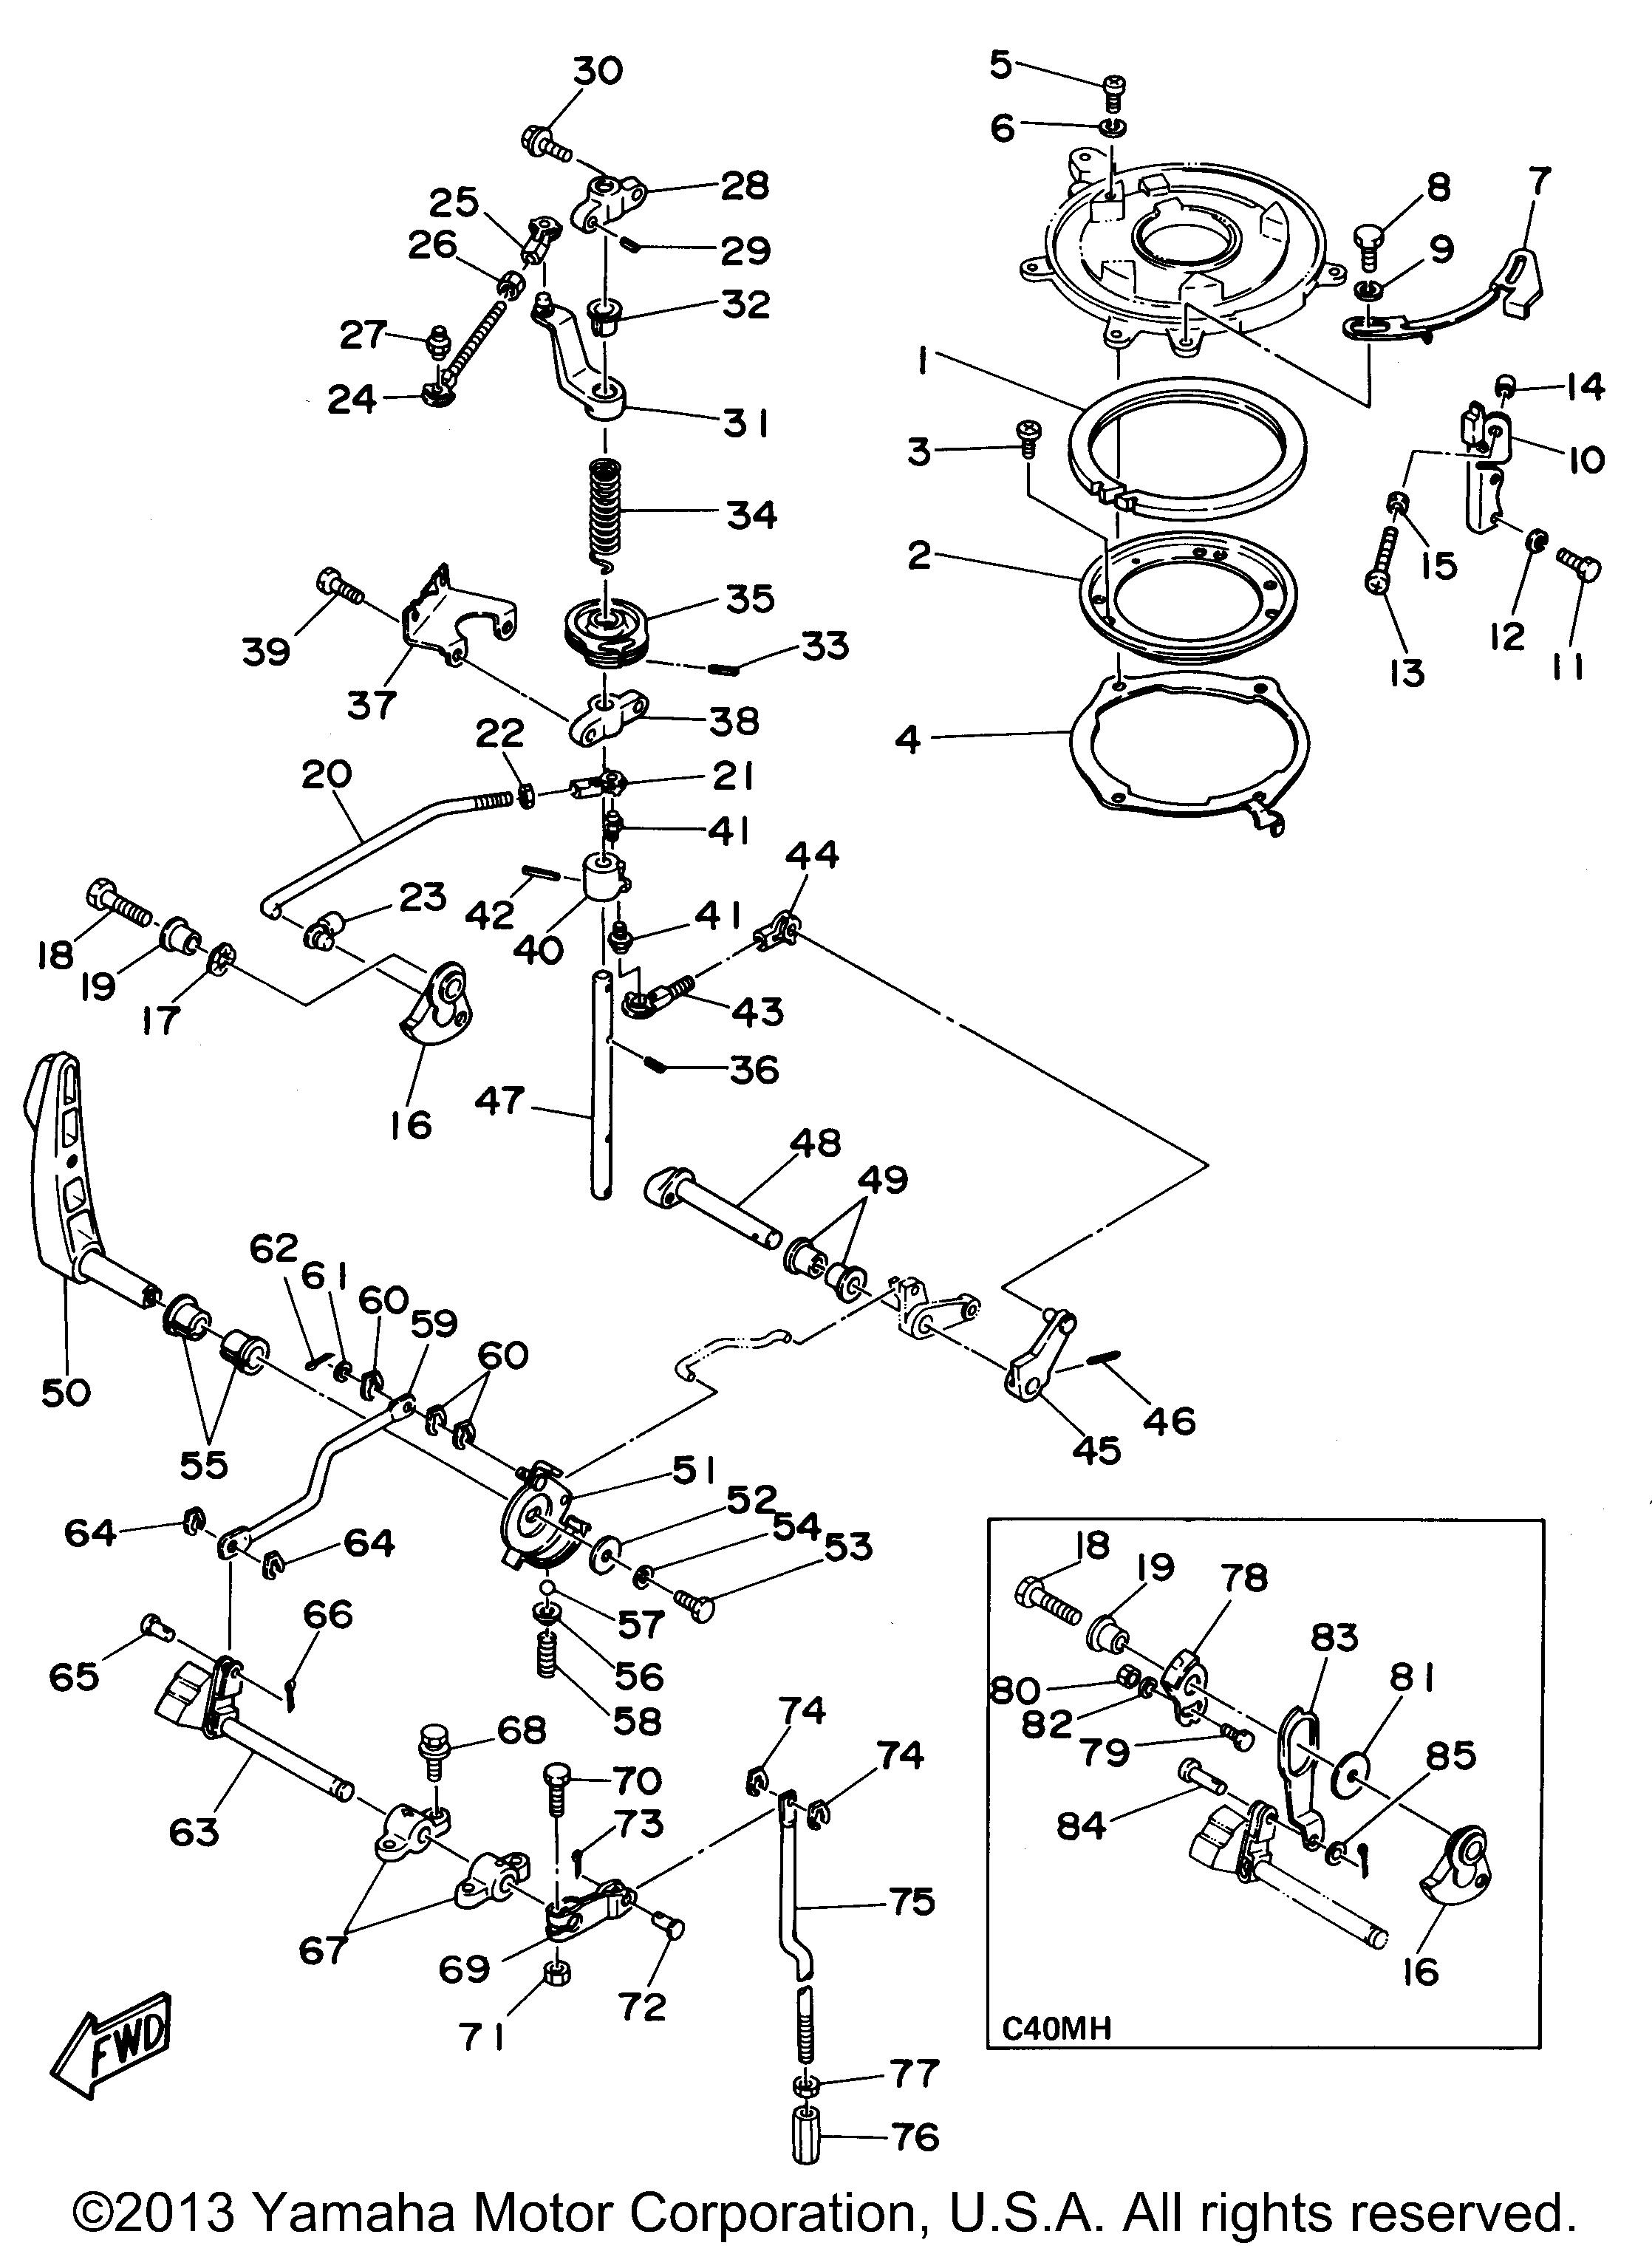 yamaha outboard engine diagram fwq convertigo de Boat Water System Diagram yamaha outboard engine diagram 20 14 tierarztpraxis ruffy de u2022 rh 20 14 tierarztpraxis ruffy de